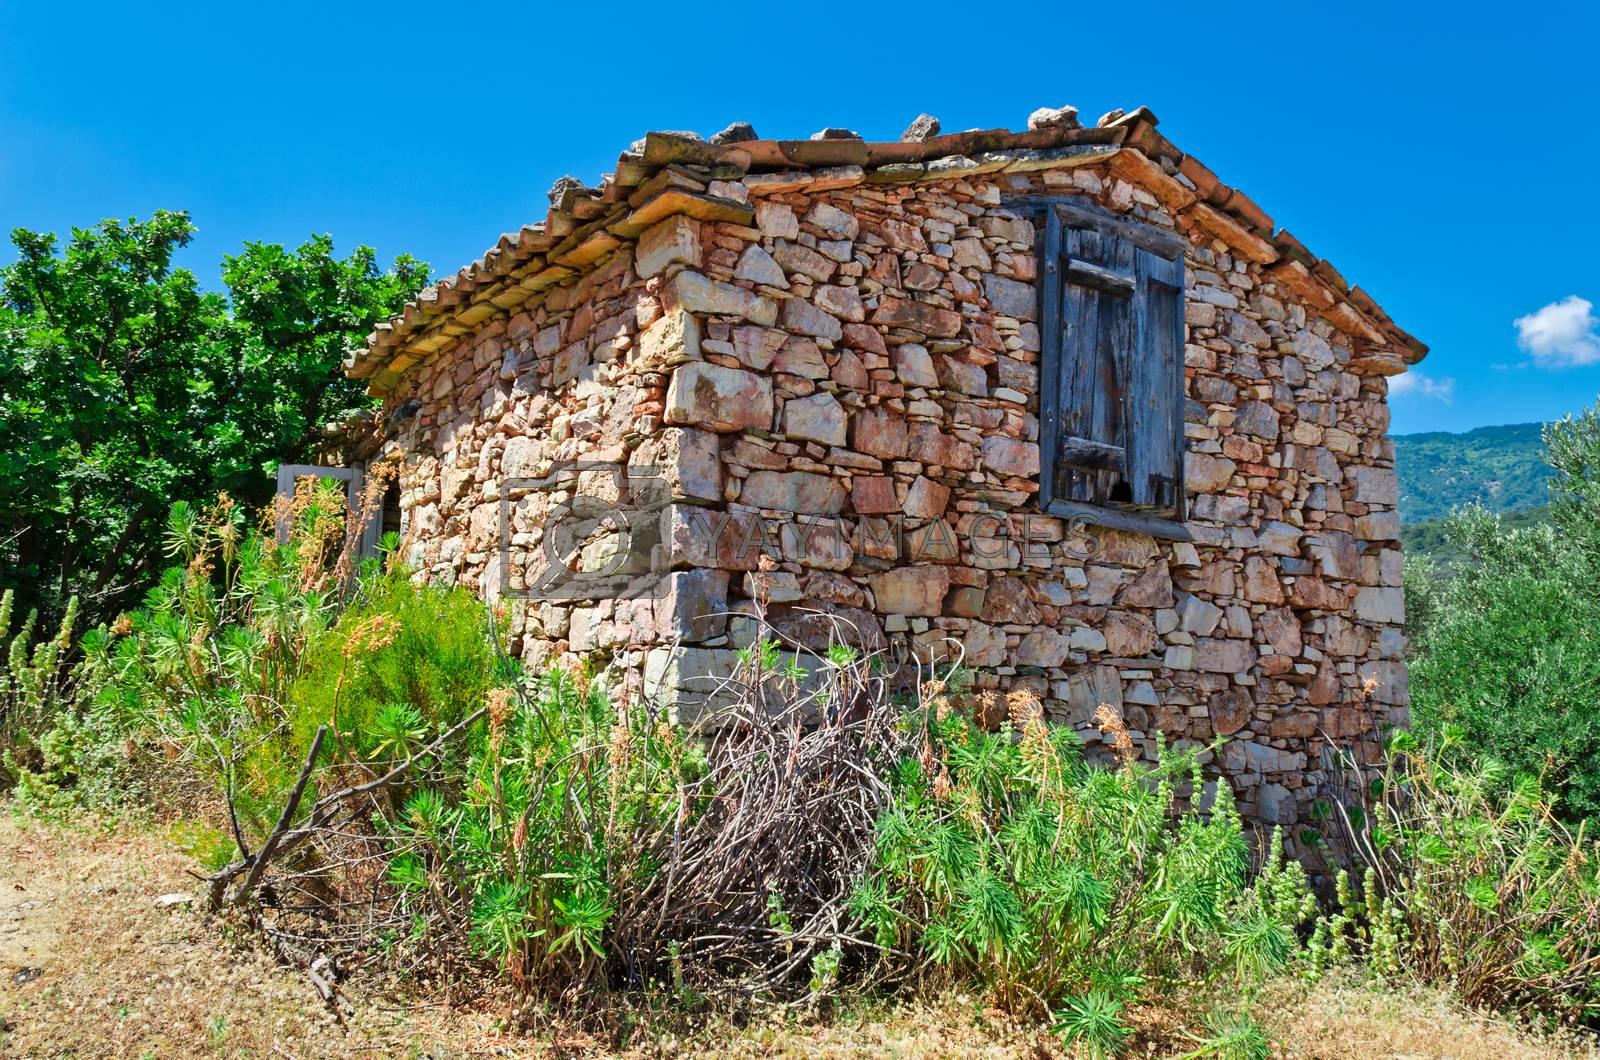 Old house near the village Vourliotes on aegean island Samos